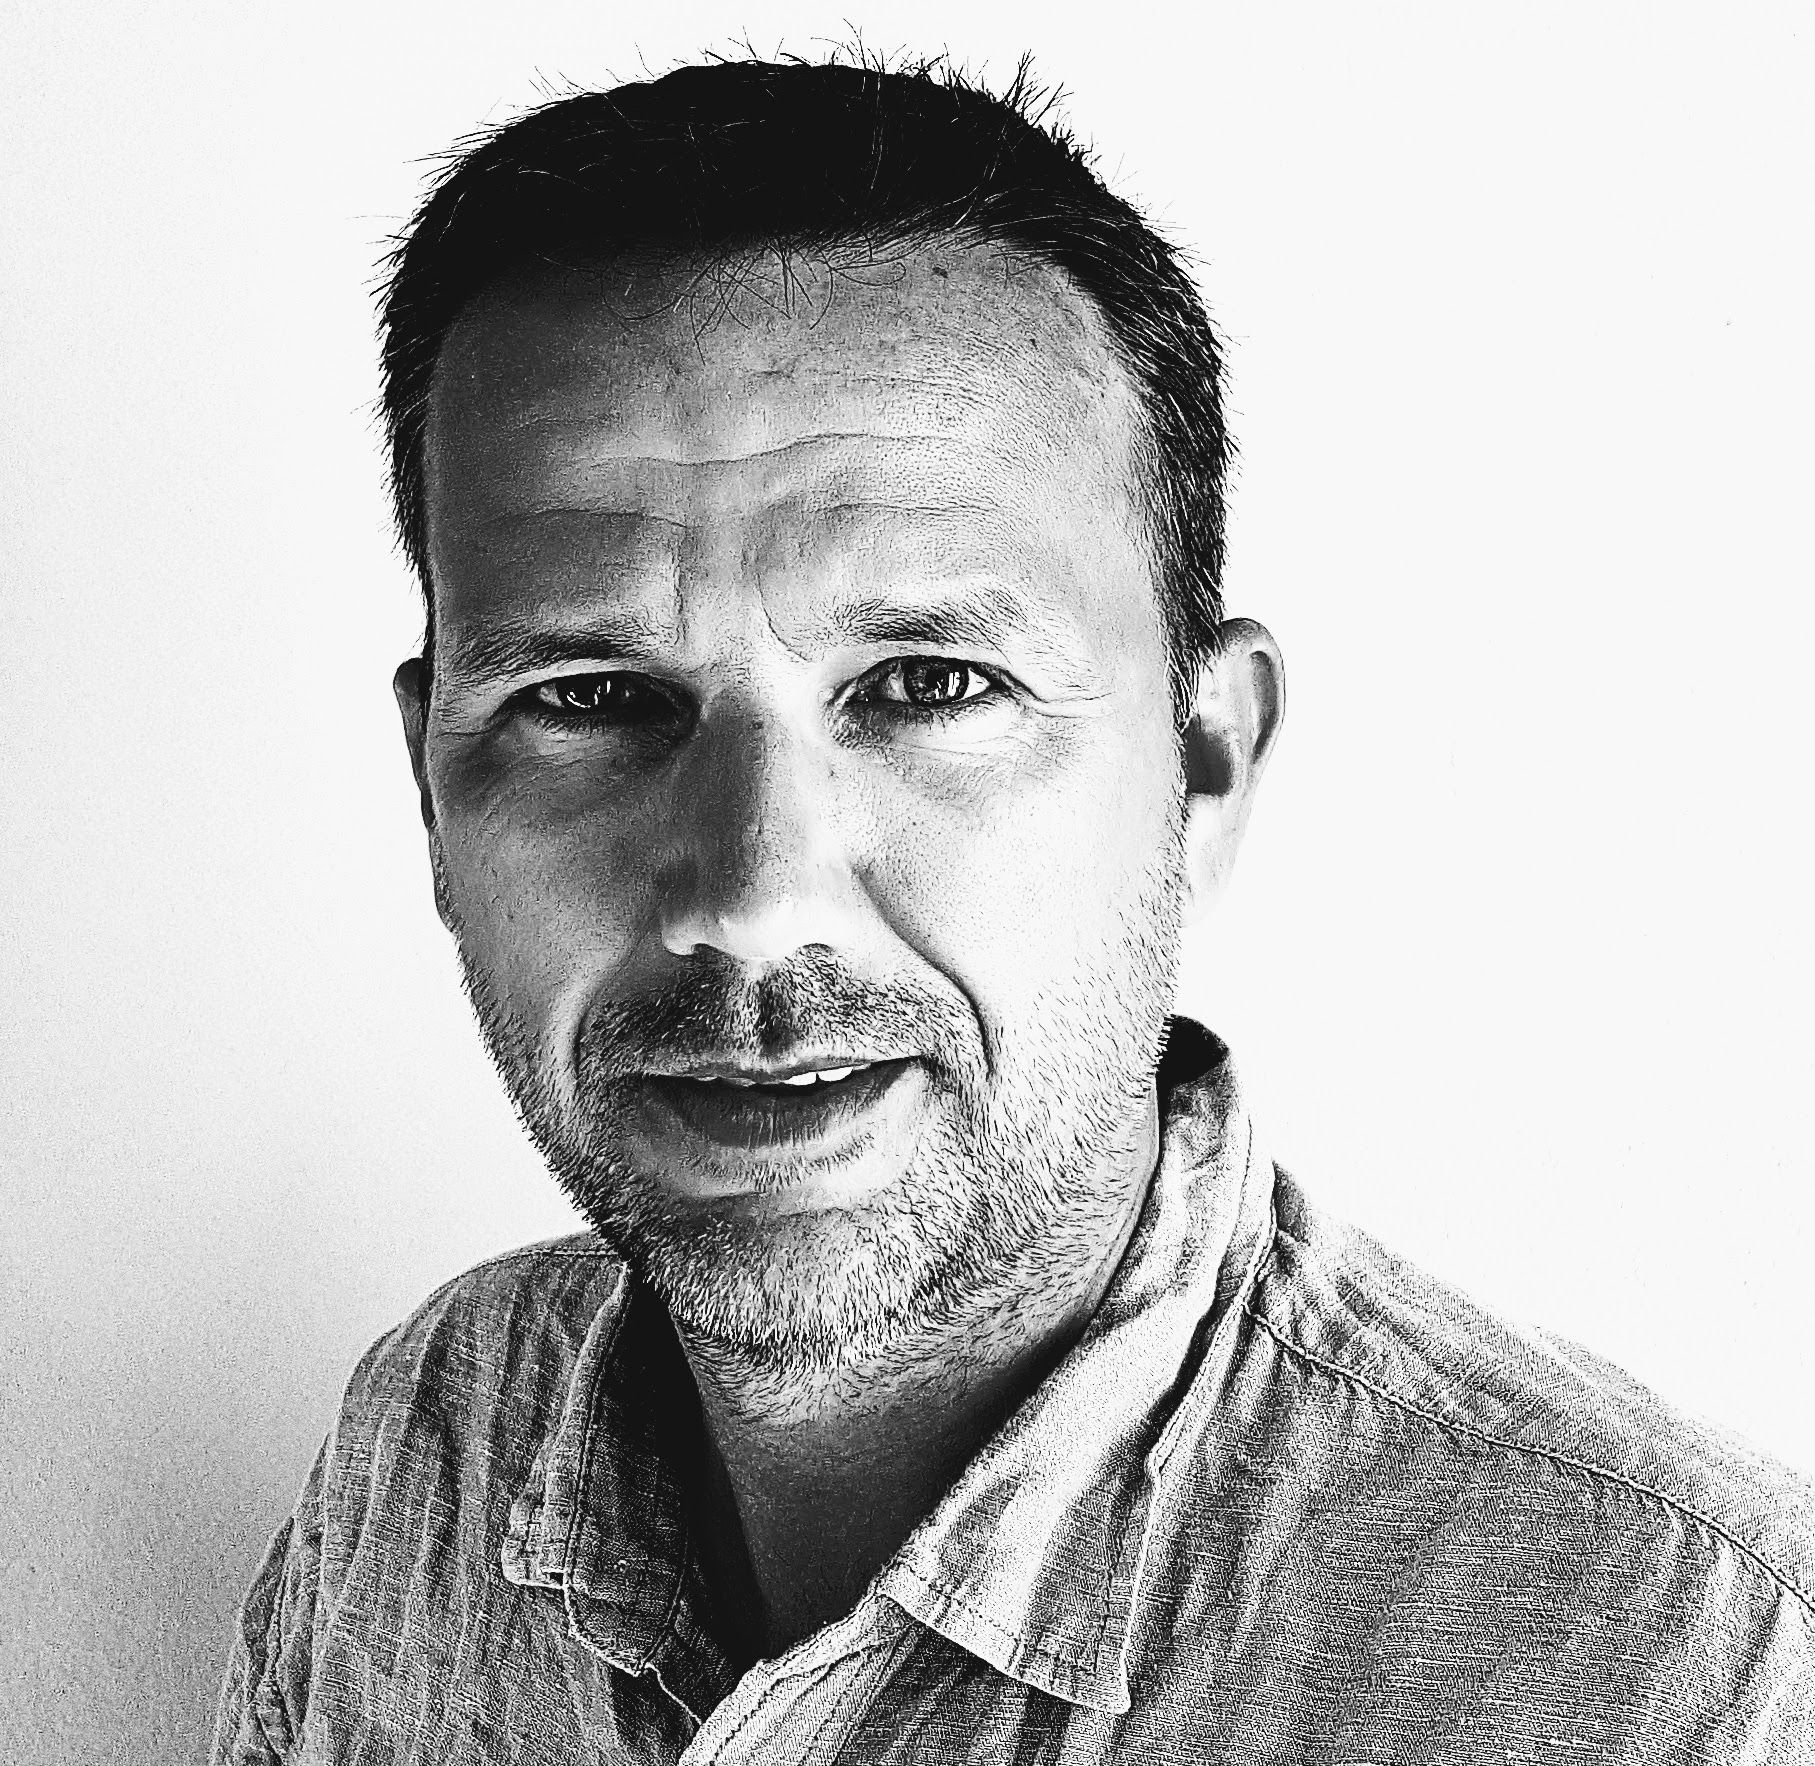 Arvid Steen